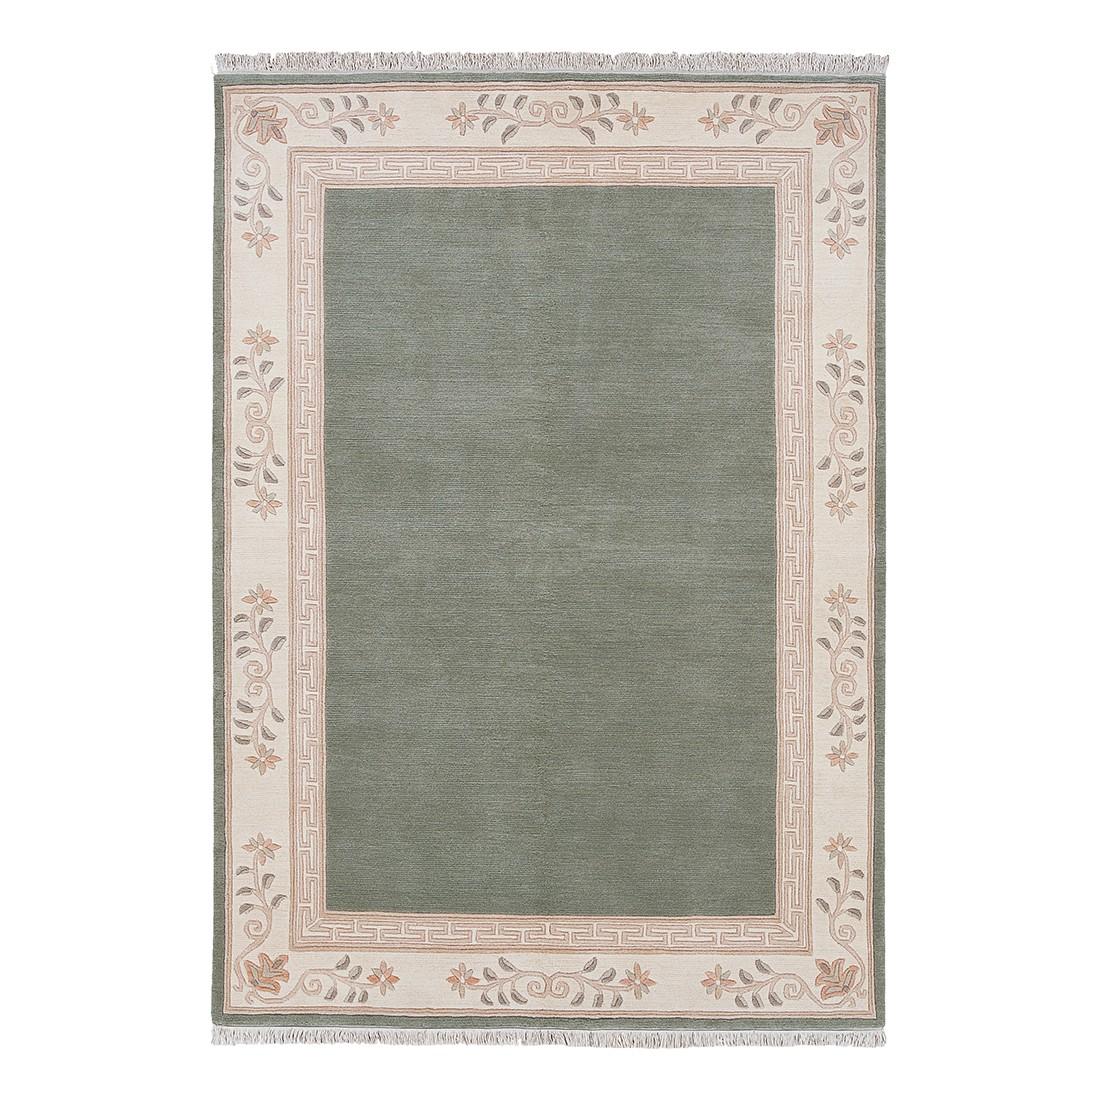 Teppich Floral - Grün - 170 x 240 cm, Luxor living